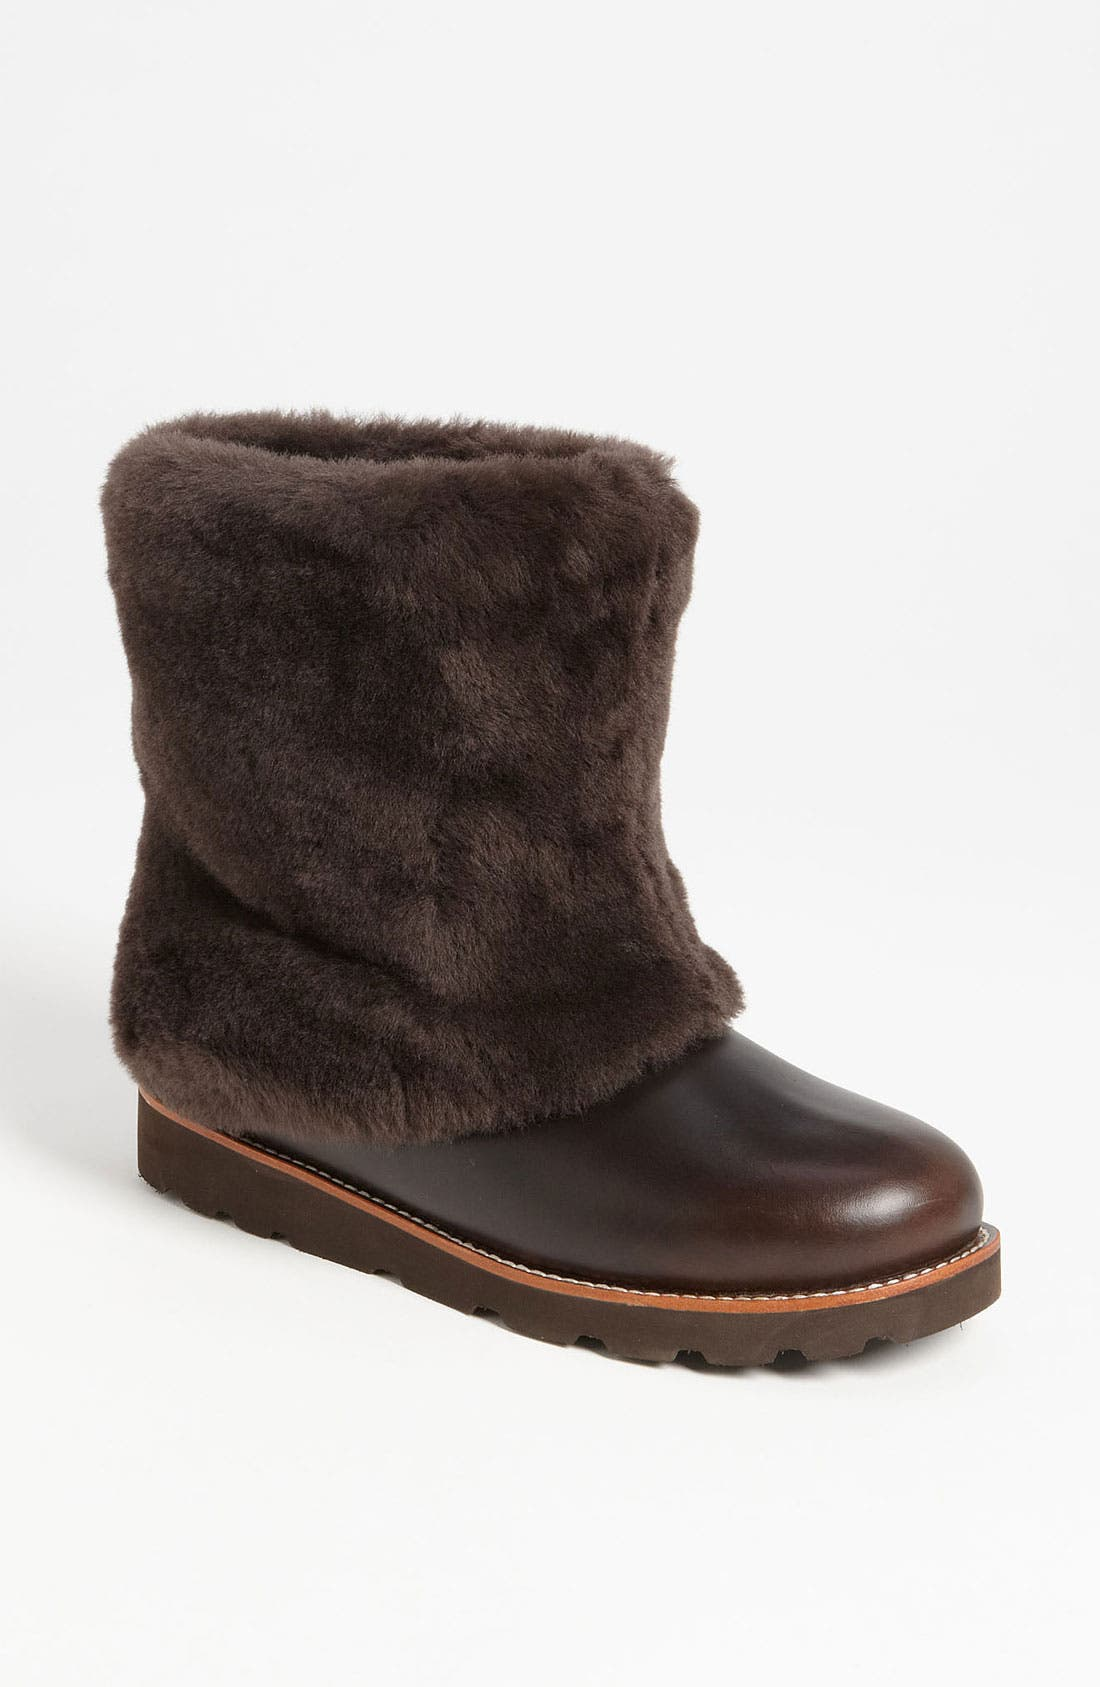 Alternate Image 1 Selected - UGG® Australia 'Maylin' Boot (Women)